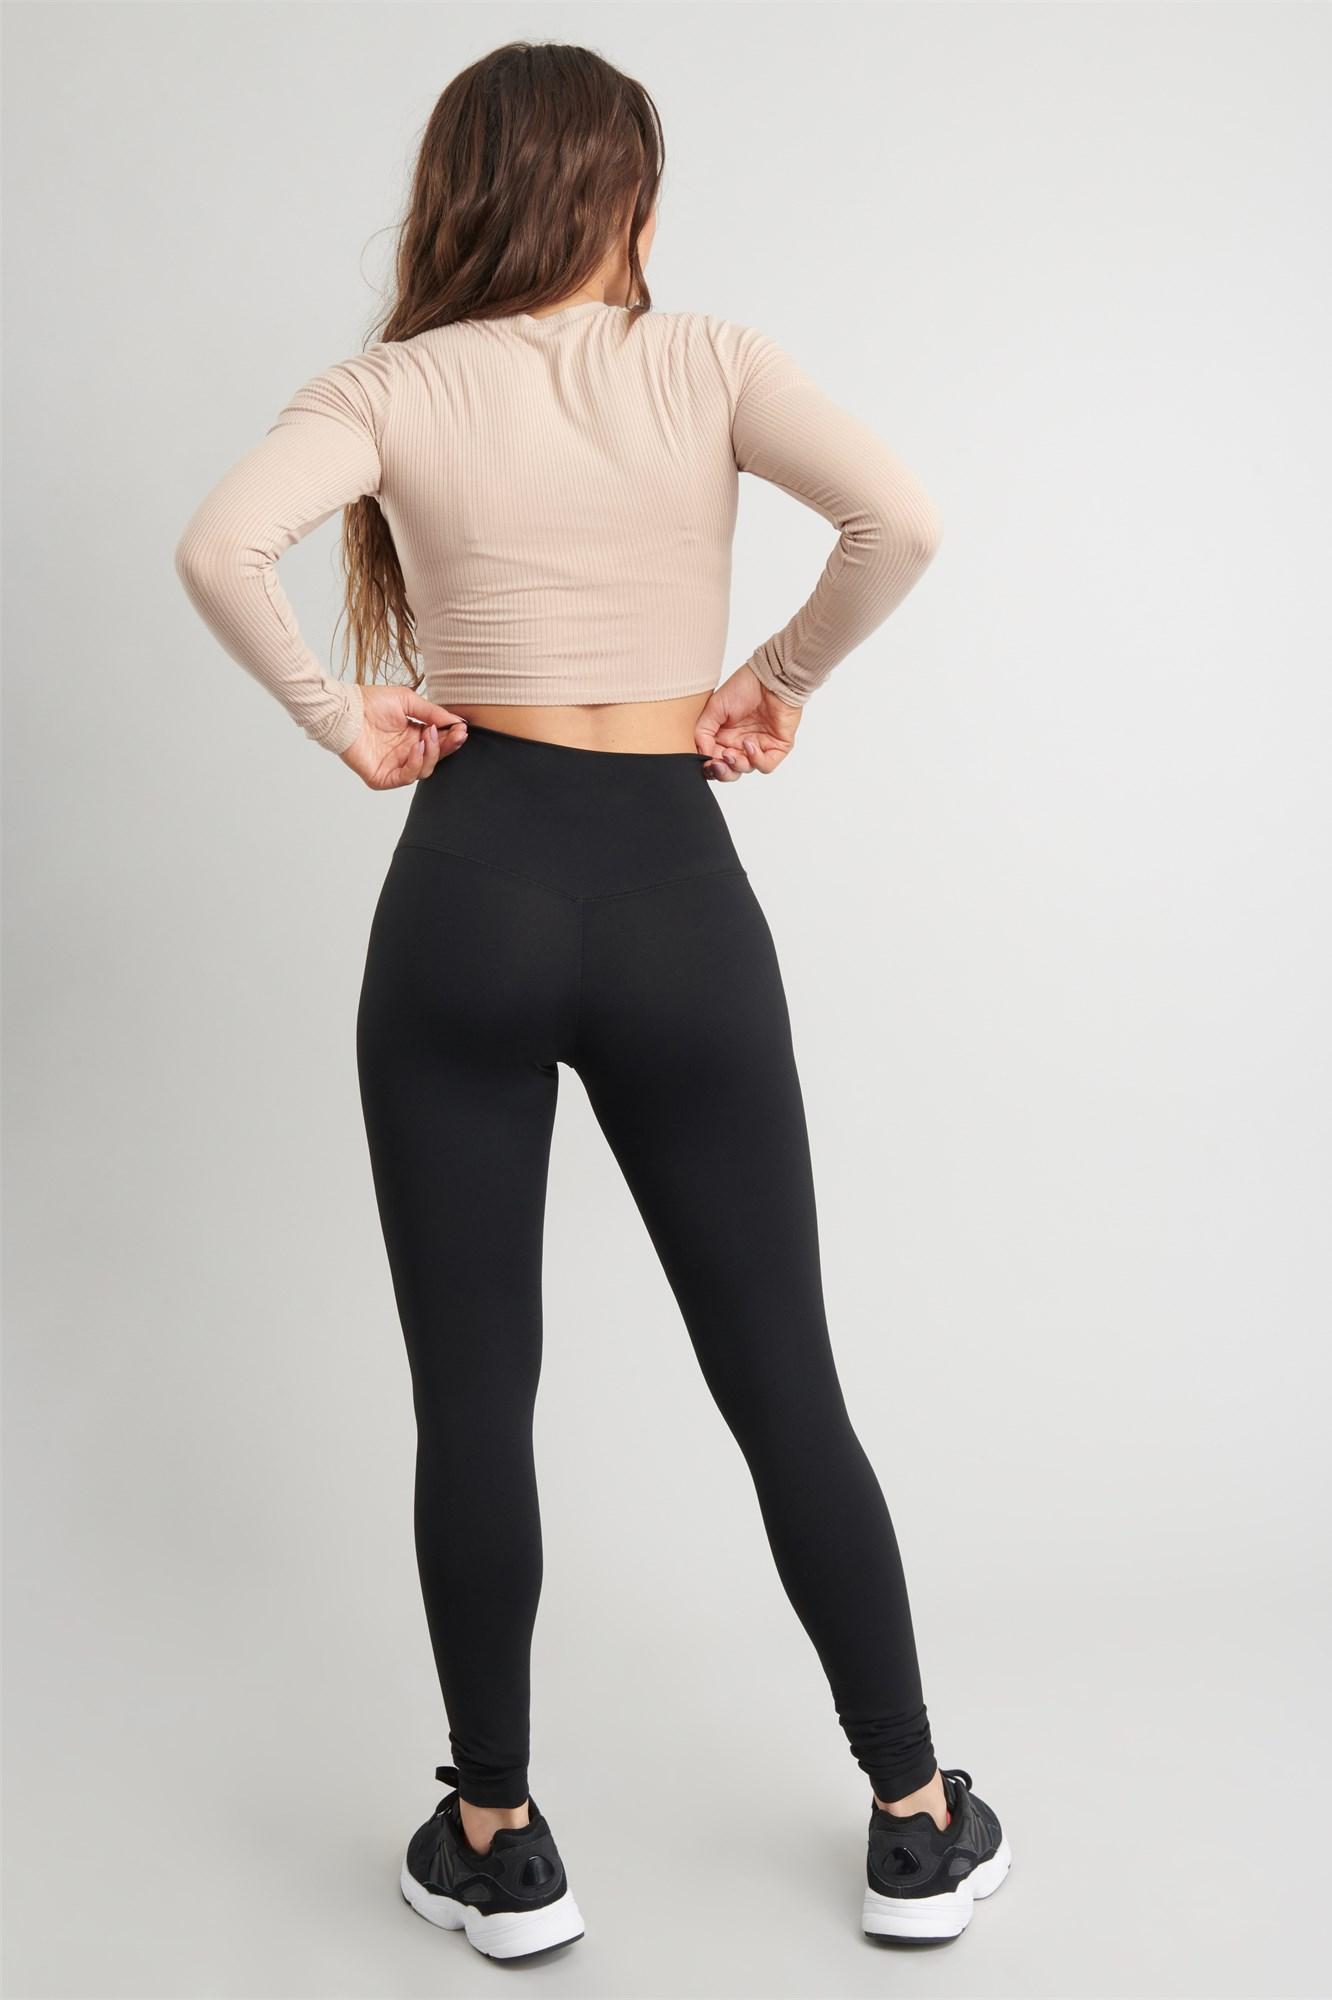 Image 4 of Ultra-High Rise Twist Waist Active Legging